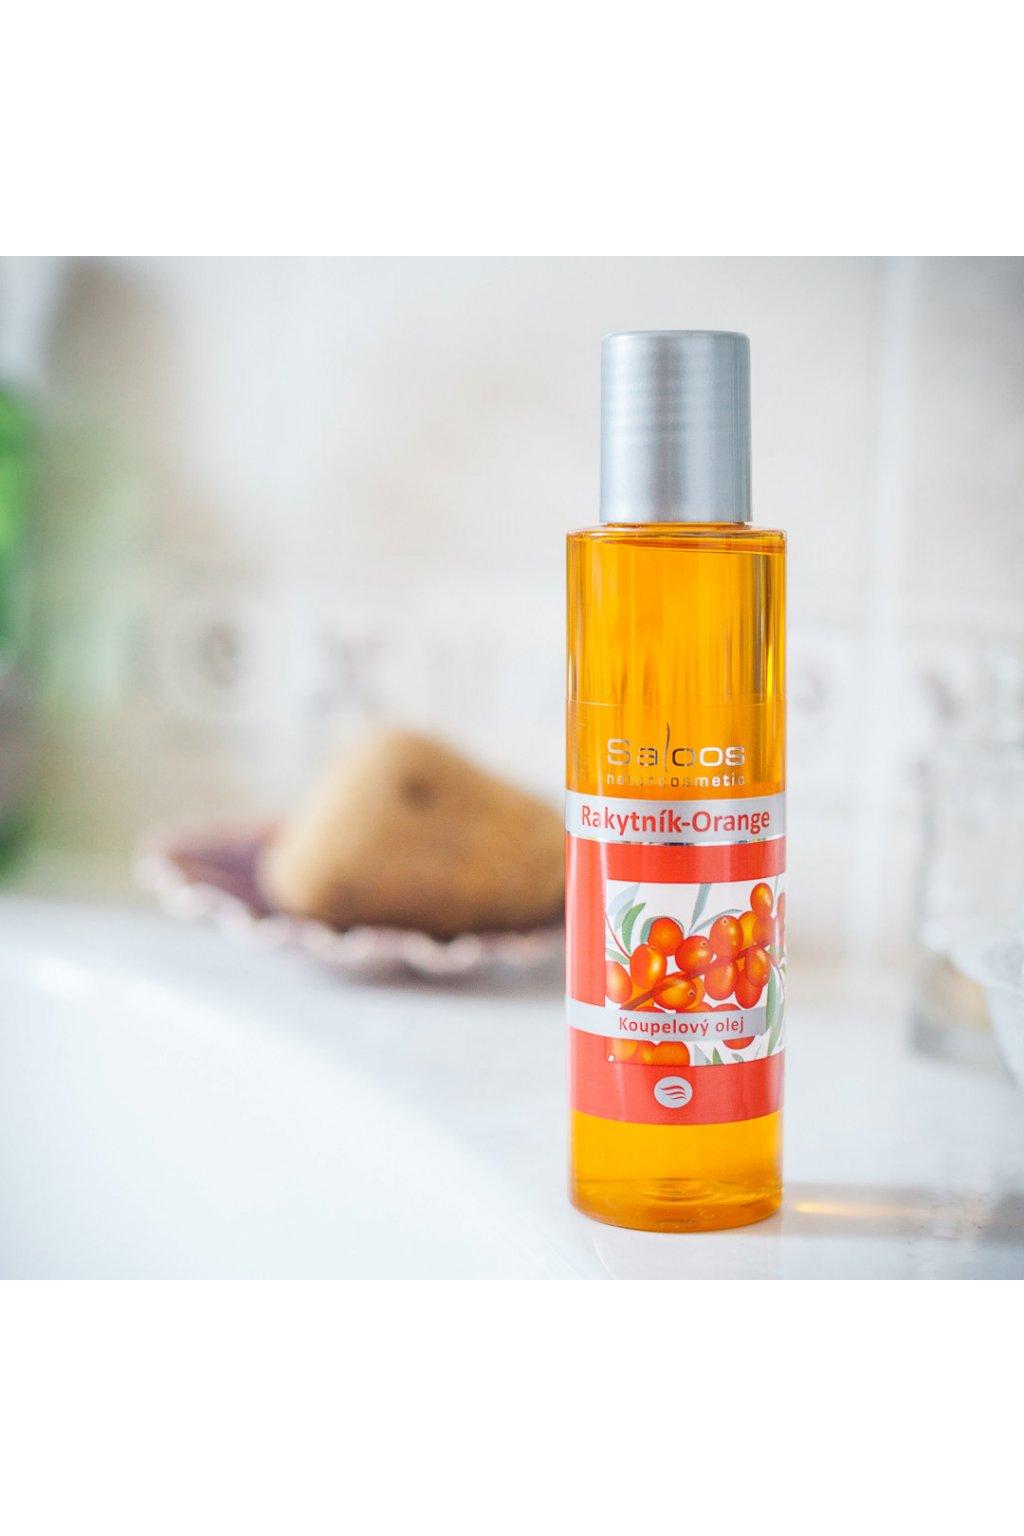 Saloos koupelový olej Rakytník Orange (varianta 1000ml)